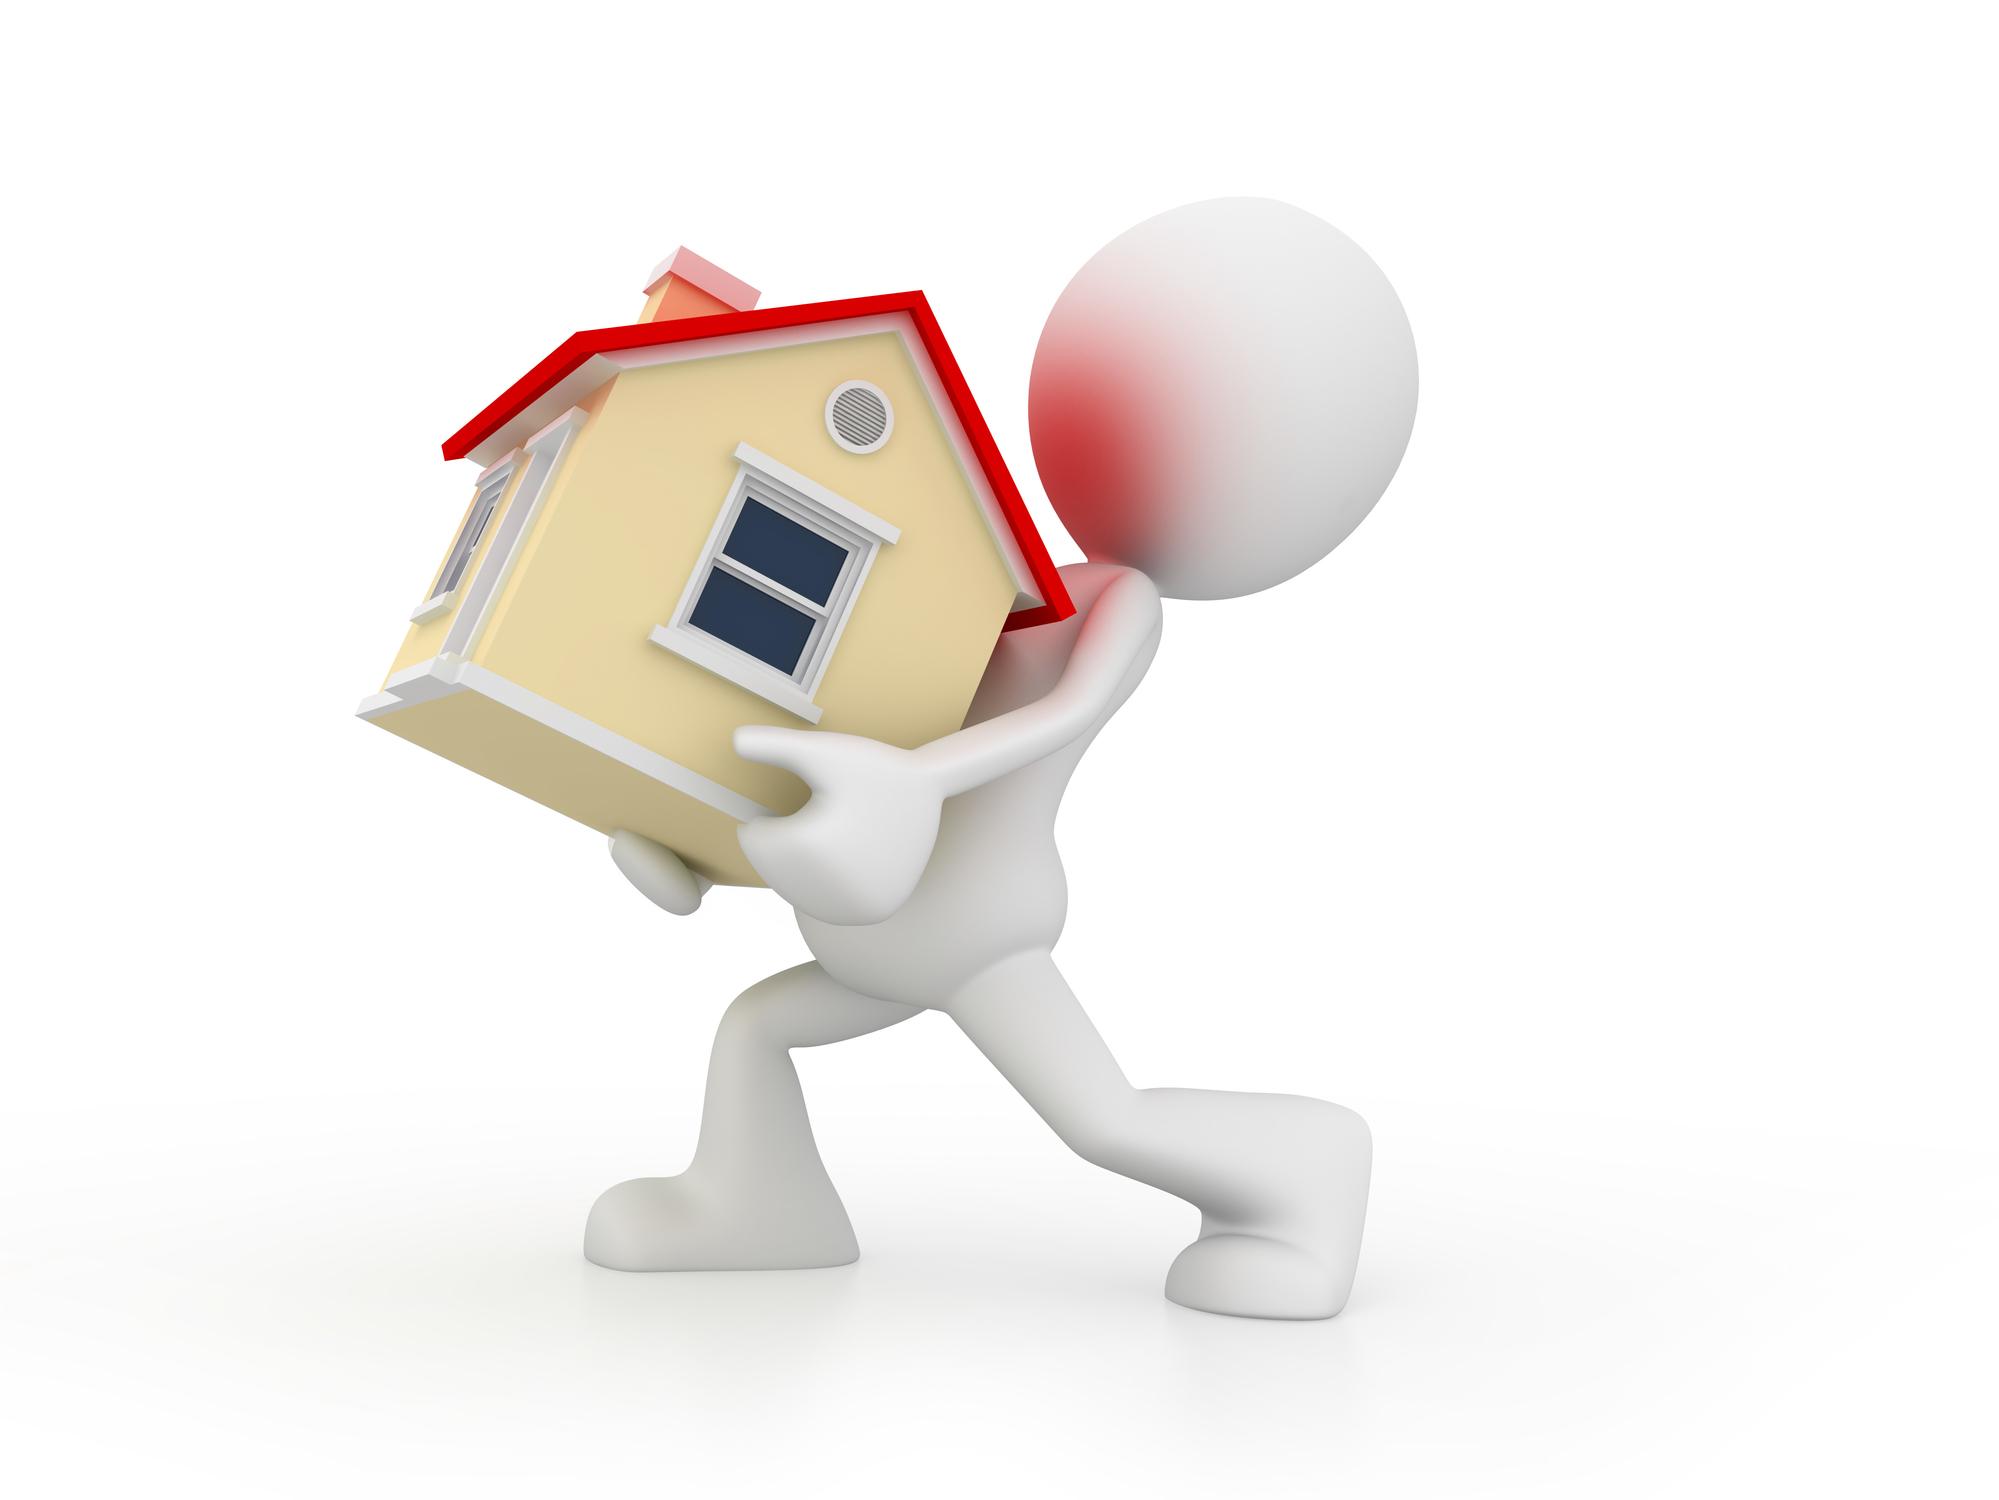 3D-mann som bærer på et hus